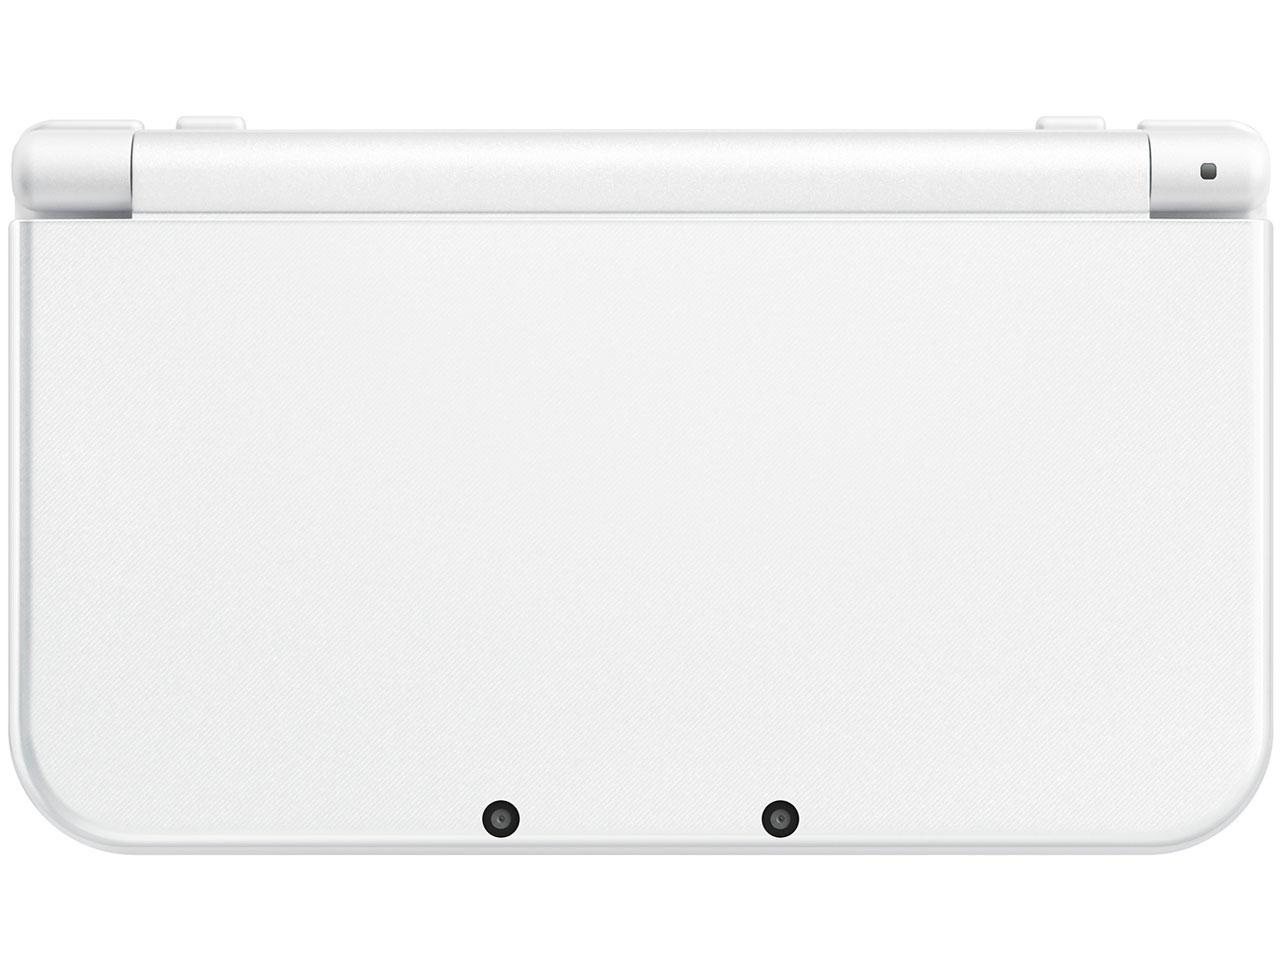 Newニンテンドー3DS LL パールホワイト